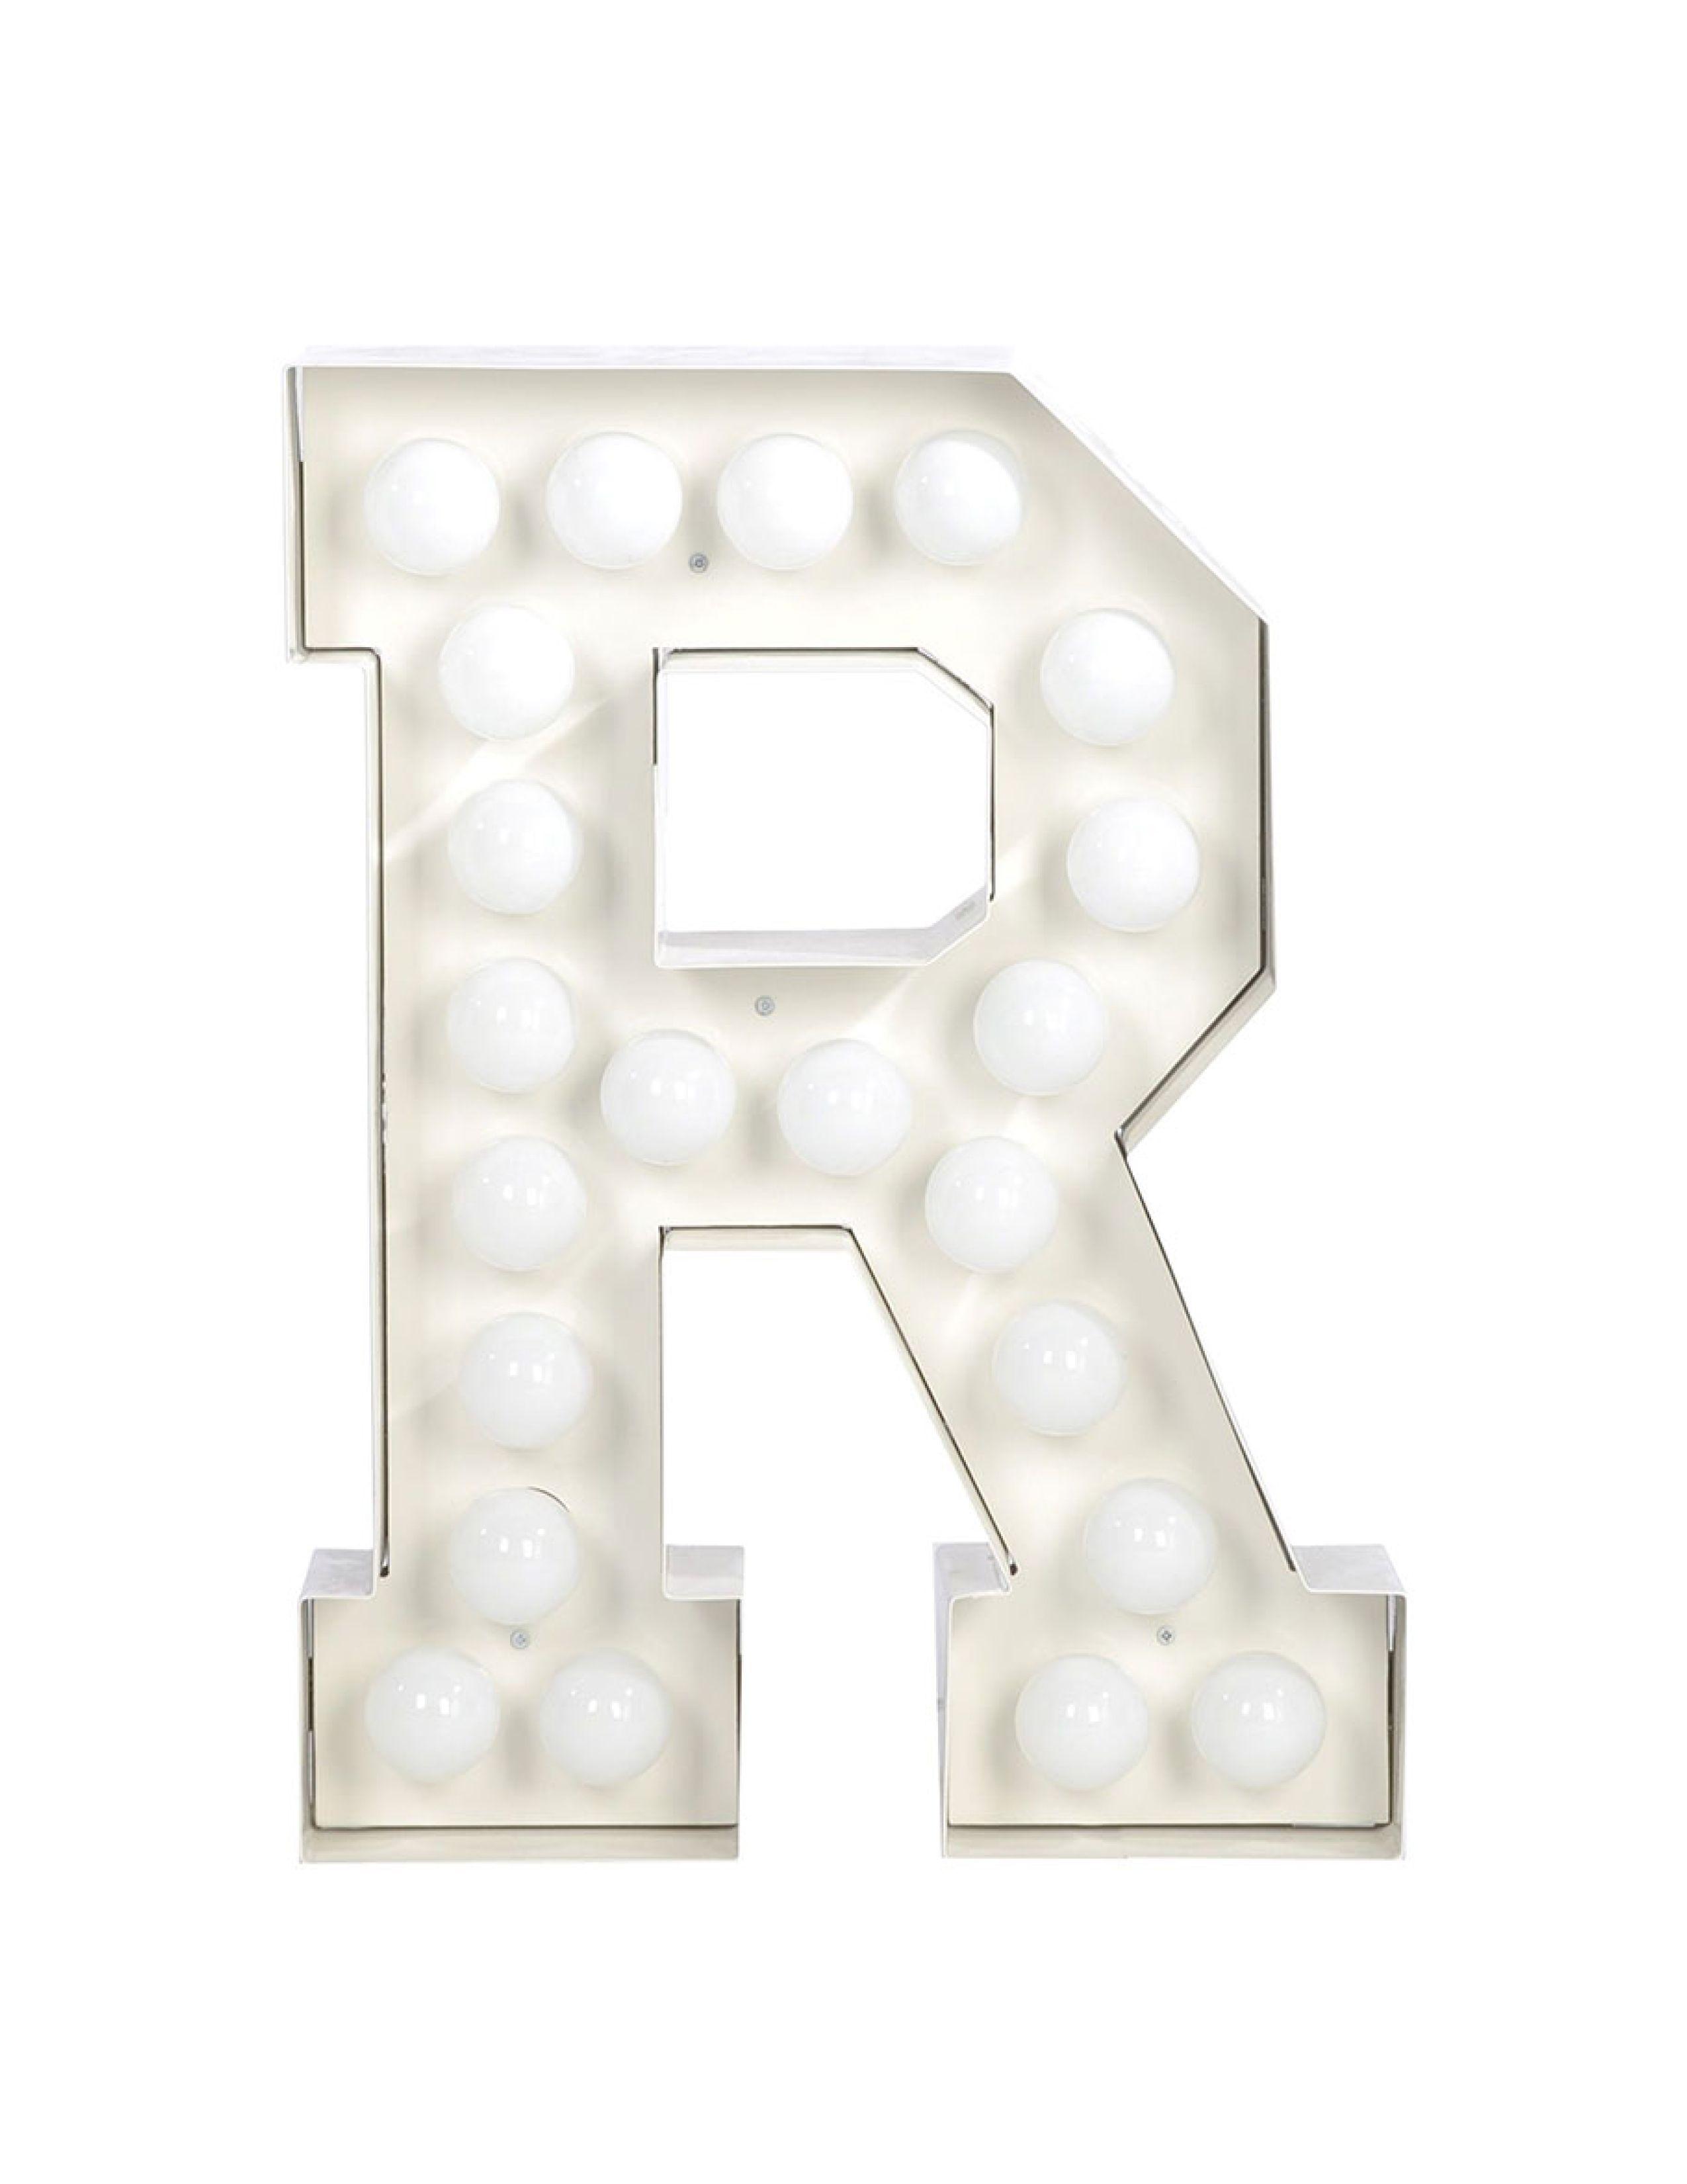 Seletti VEGAZ LED verlichting R